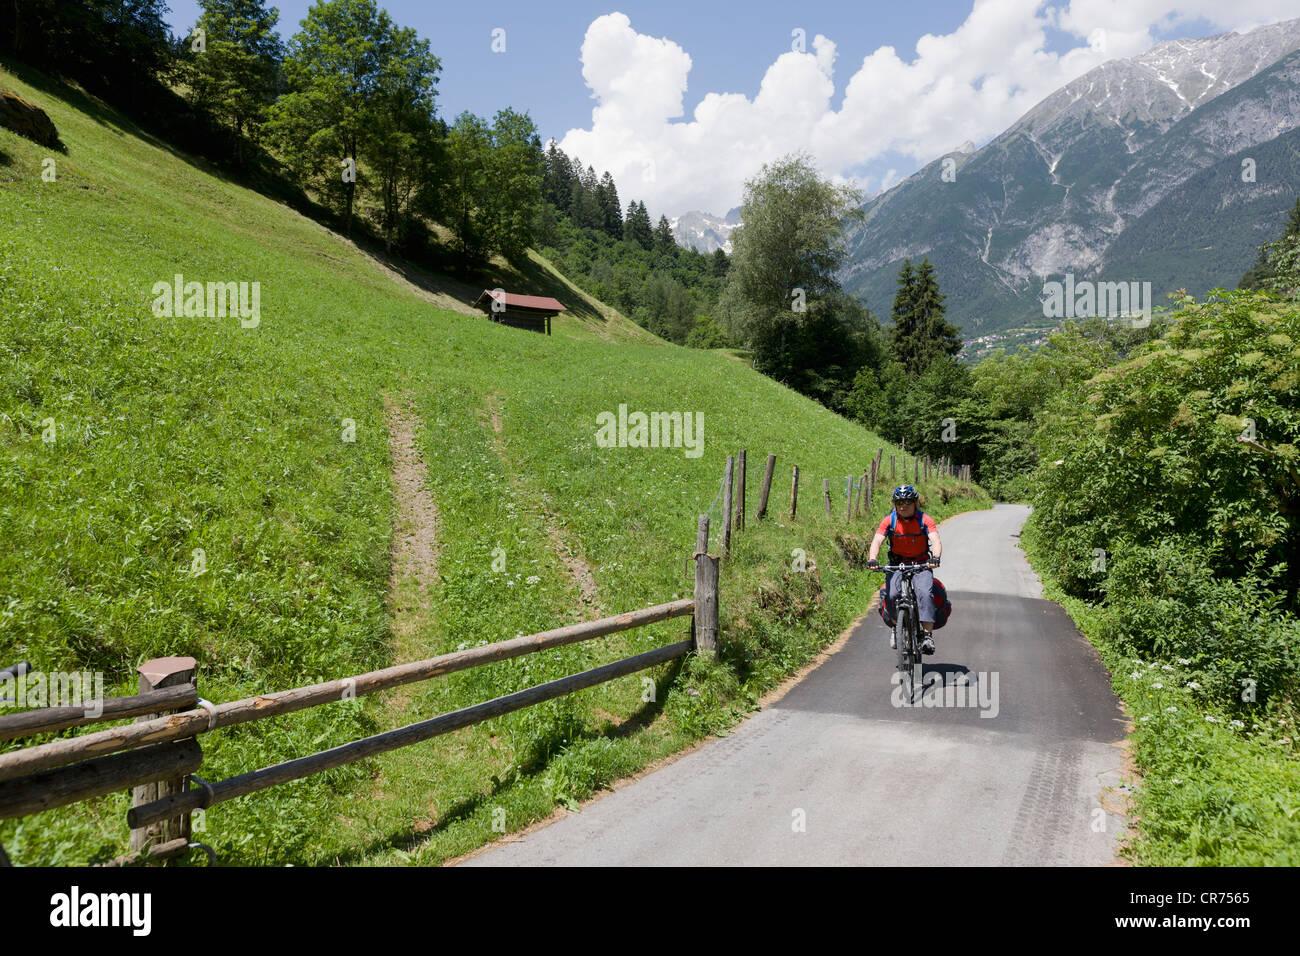 Austria, hombre maduro el ciclismo a través de vía única Foto de stock